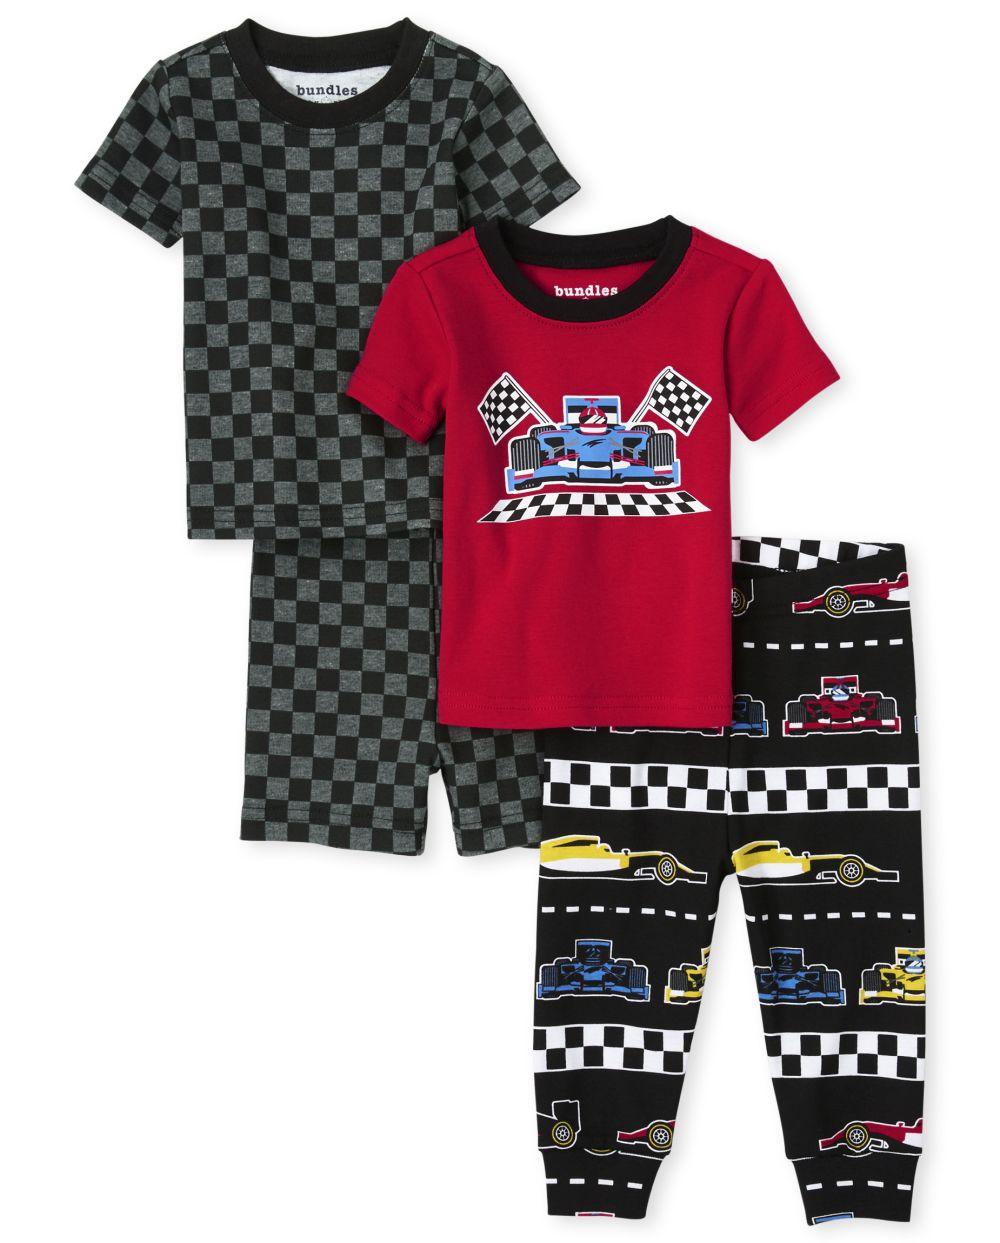 Baby And Toddler Boys Race Car Snug Fit Cotton 4-Piece Pajamas